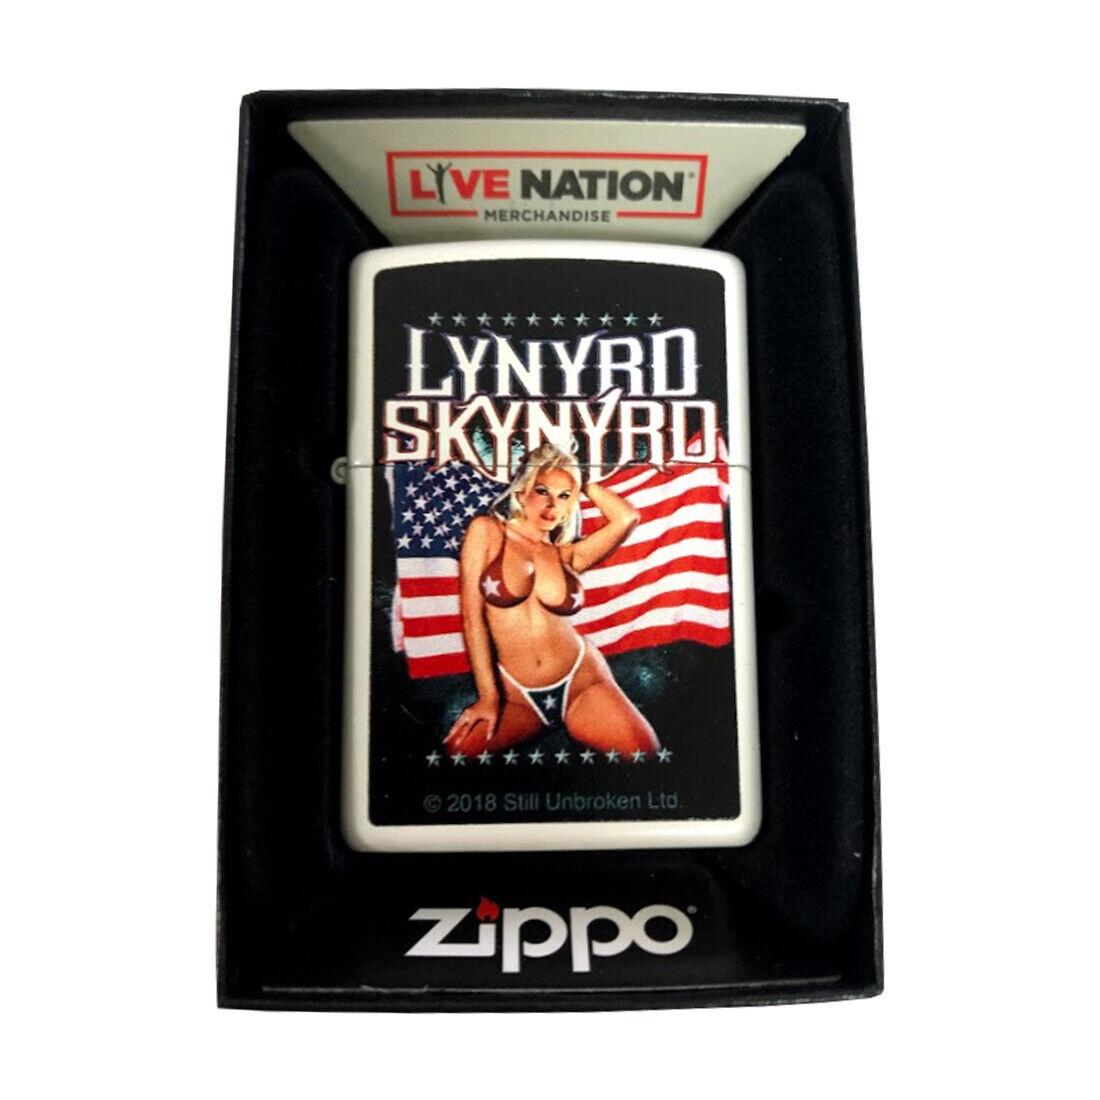 Zippo Custom Lighter White Matte Lynyrd Skynyrd Bikini Woman